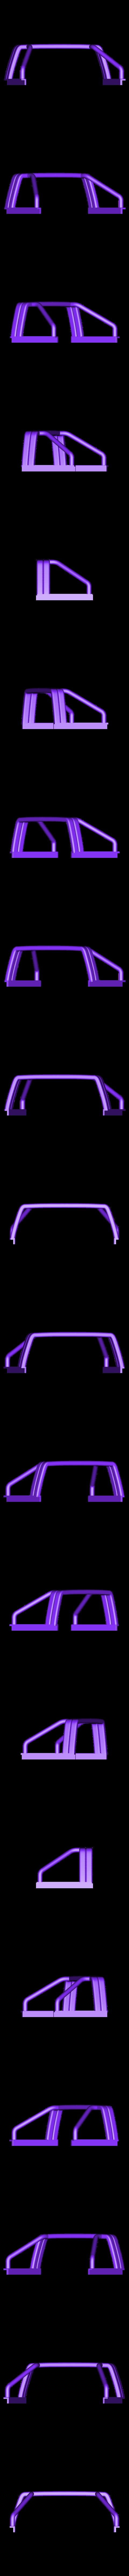 YOTA rool bar V2.stl Download STL file TOYOTA HARD BODY SHELL ROOL BAR  • 3D printer design, kiatkla